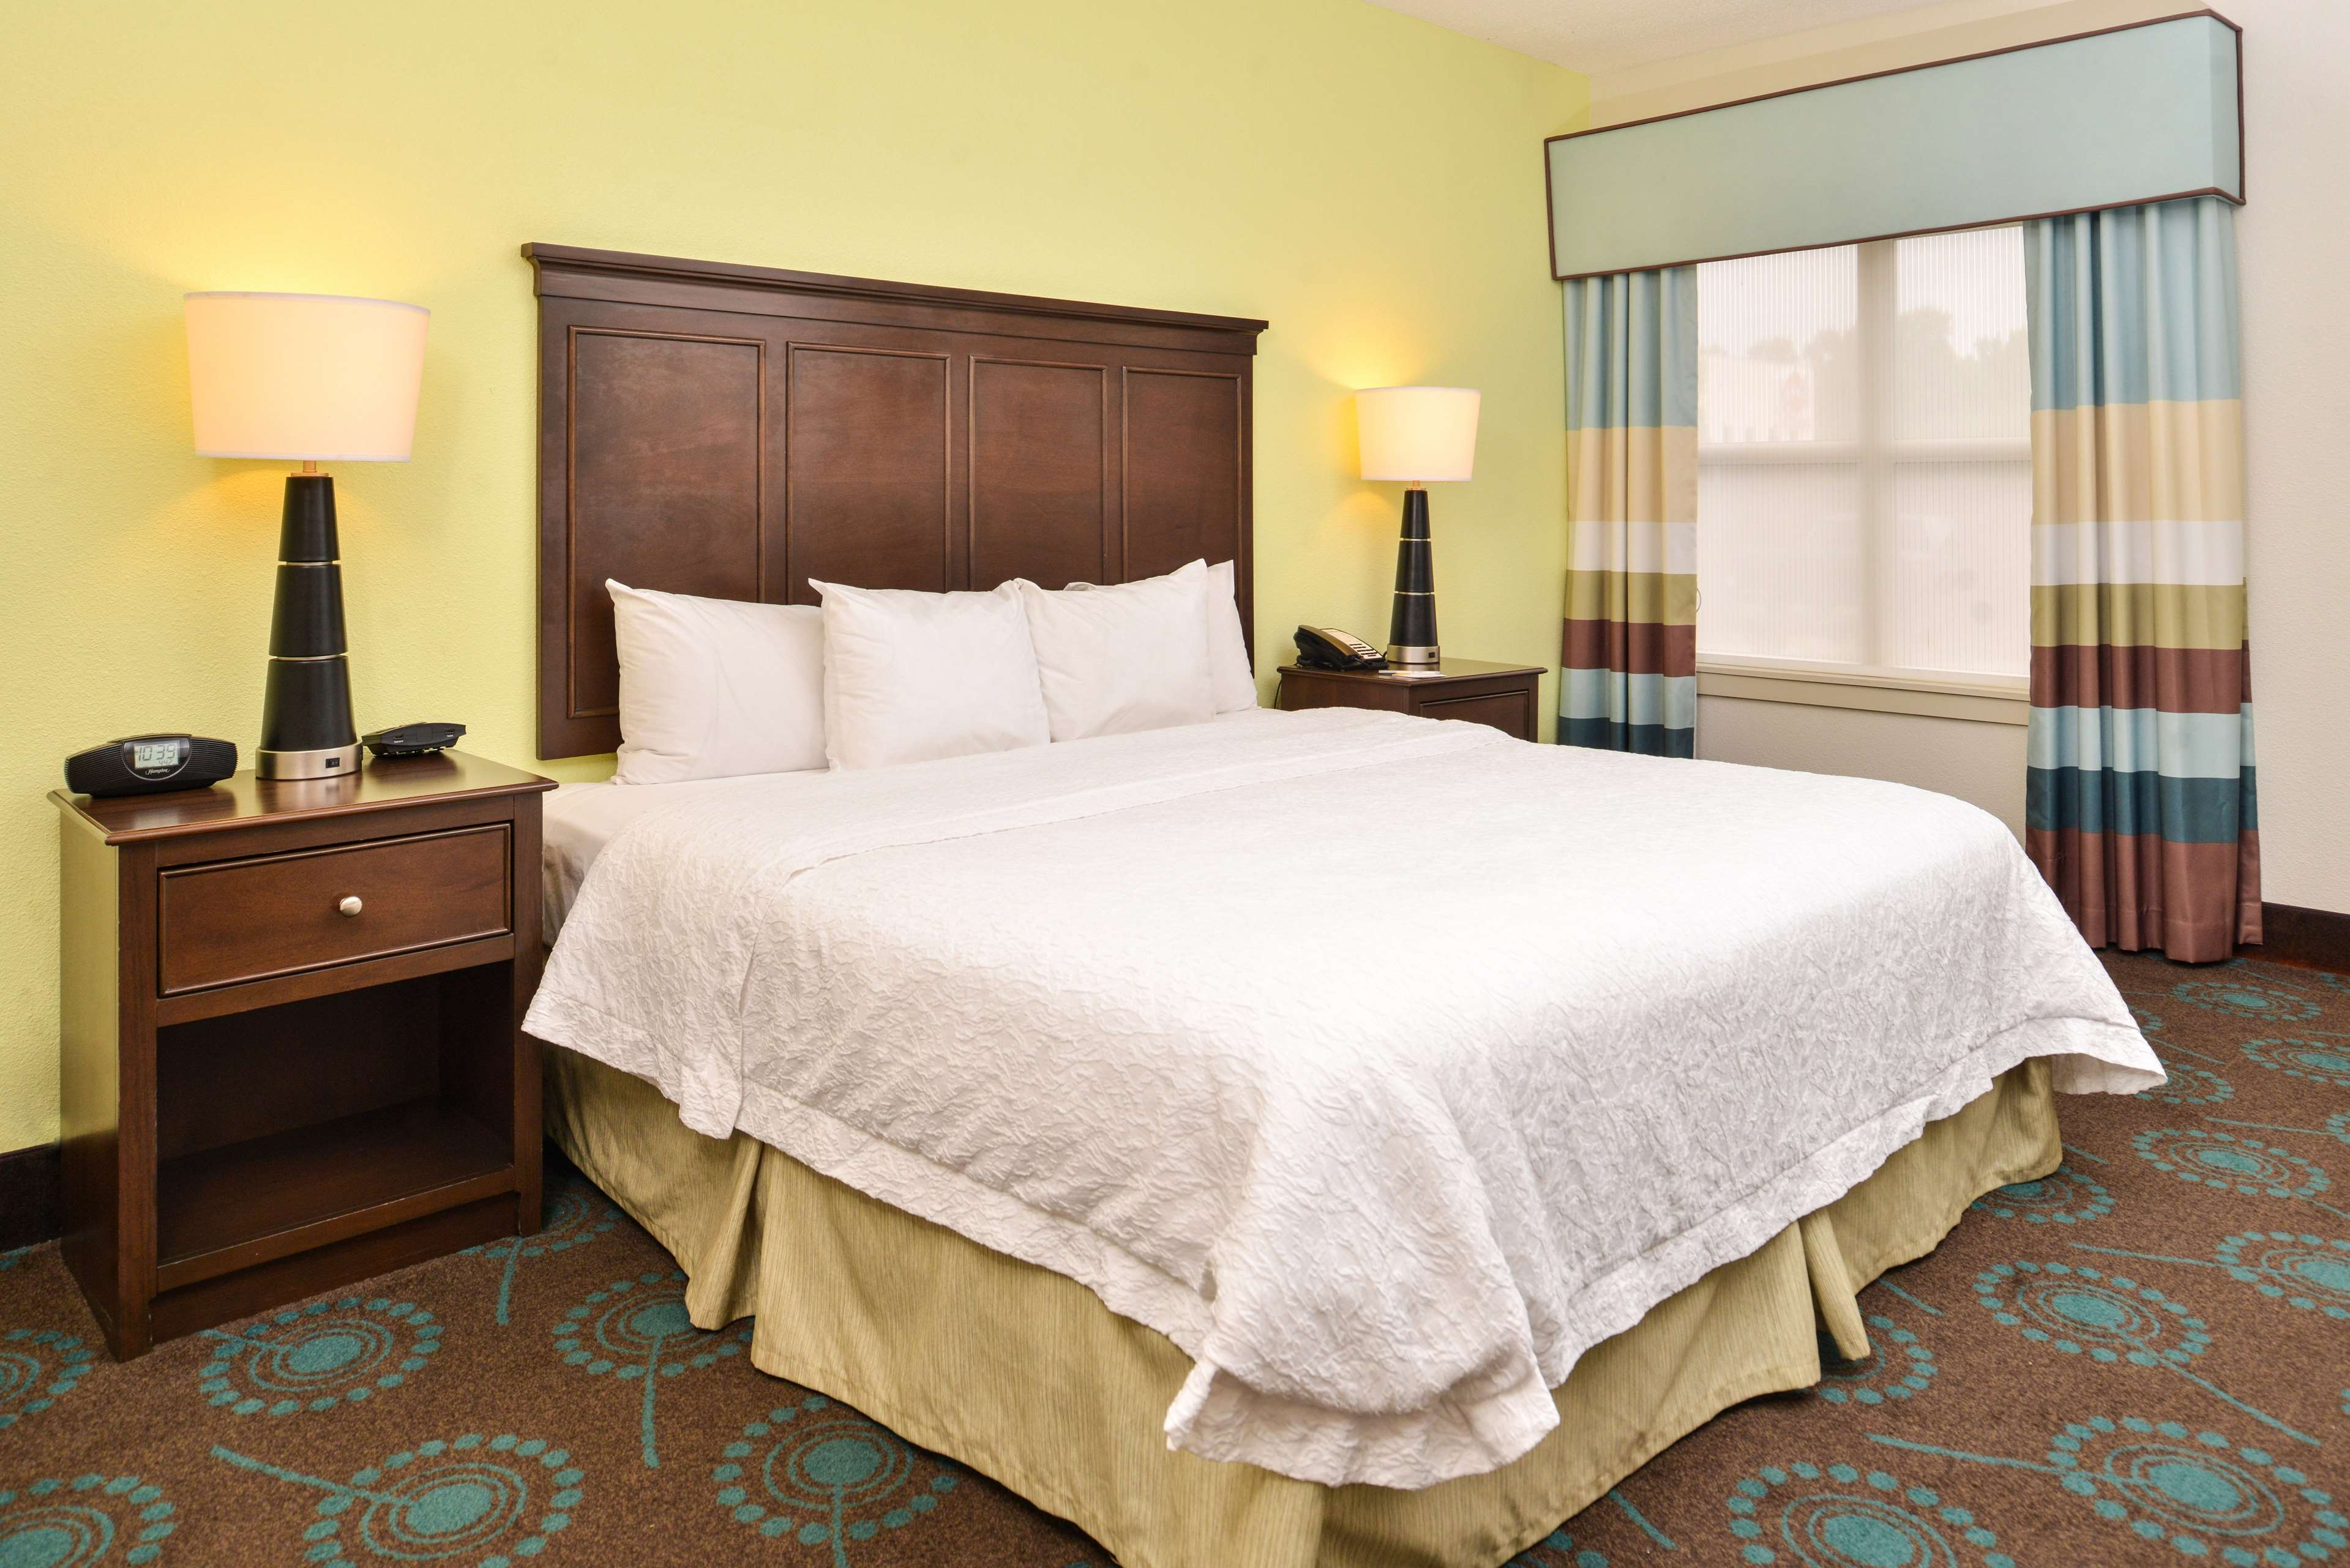 Hampton Inn & Suites Newport News (Oyster Point) image 26